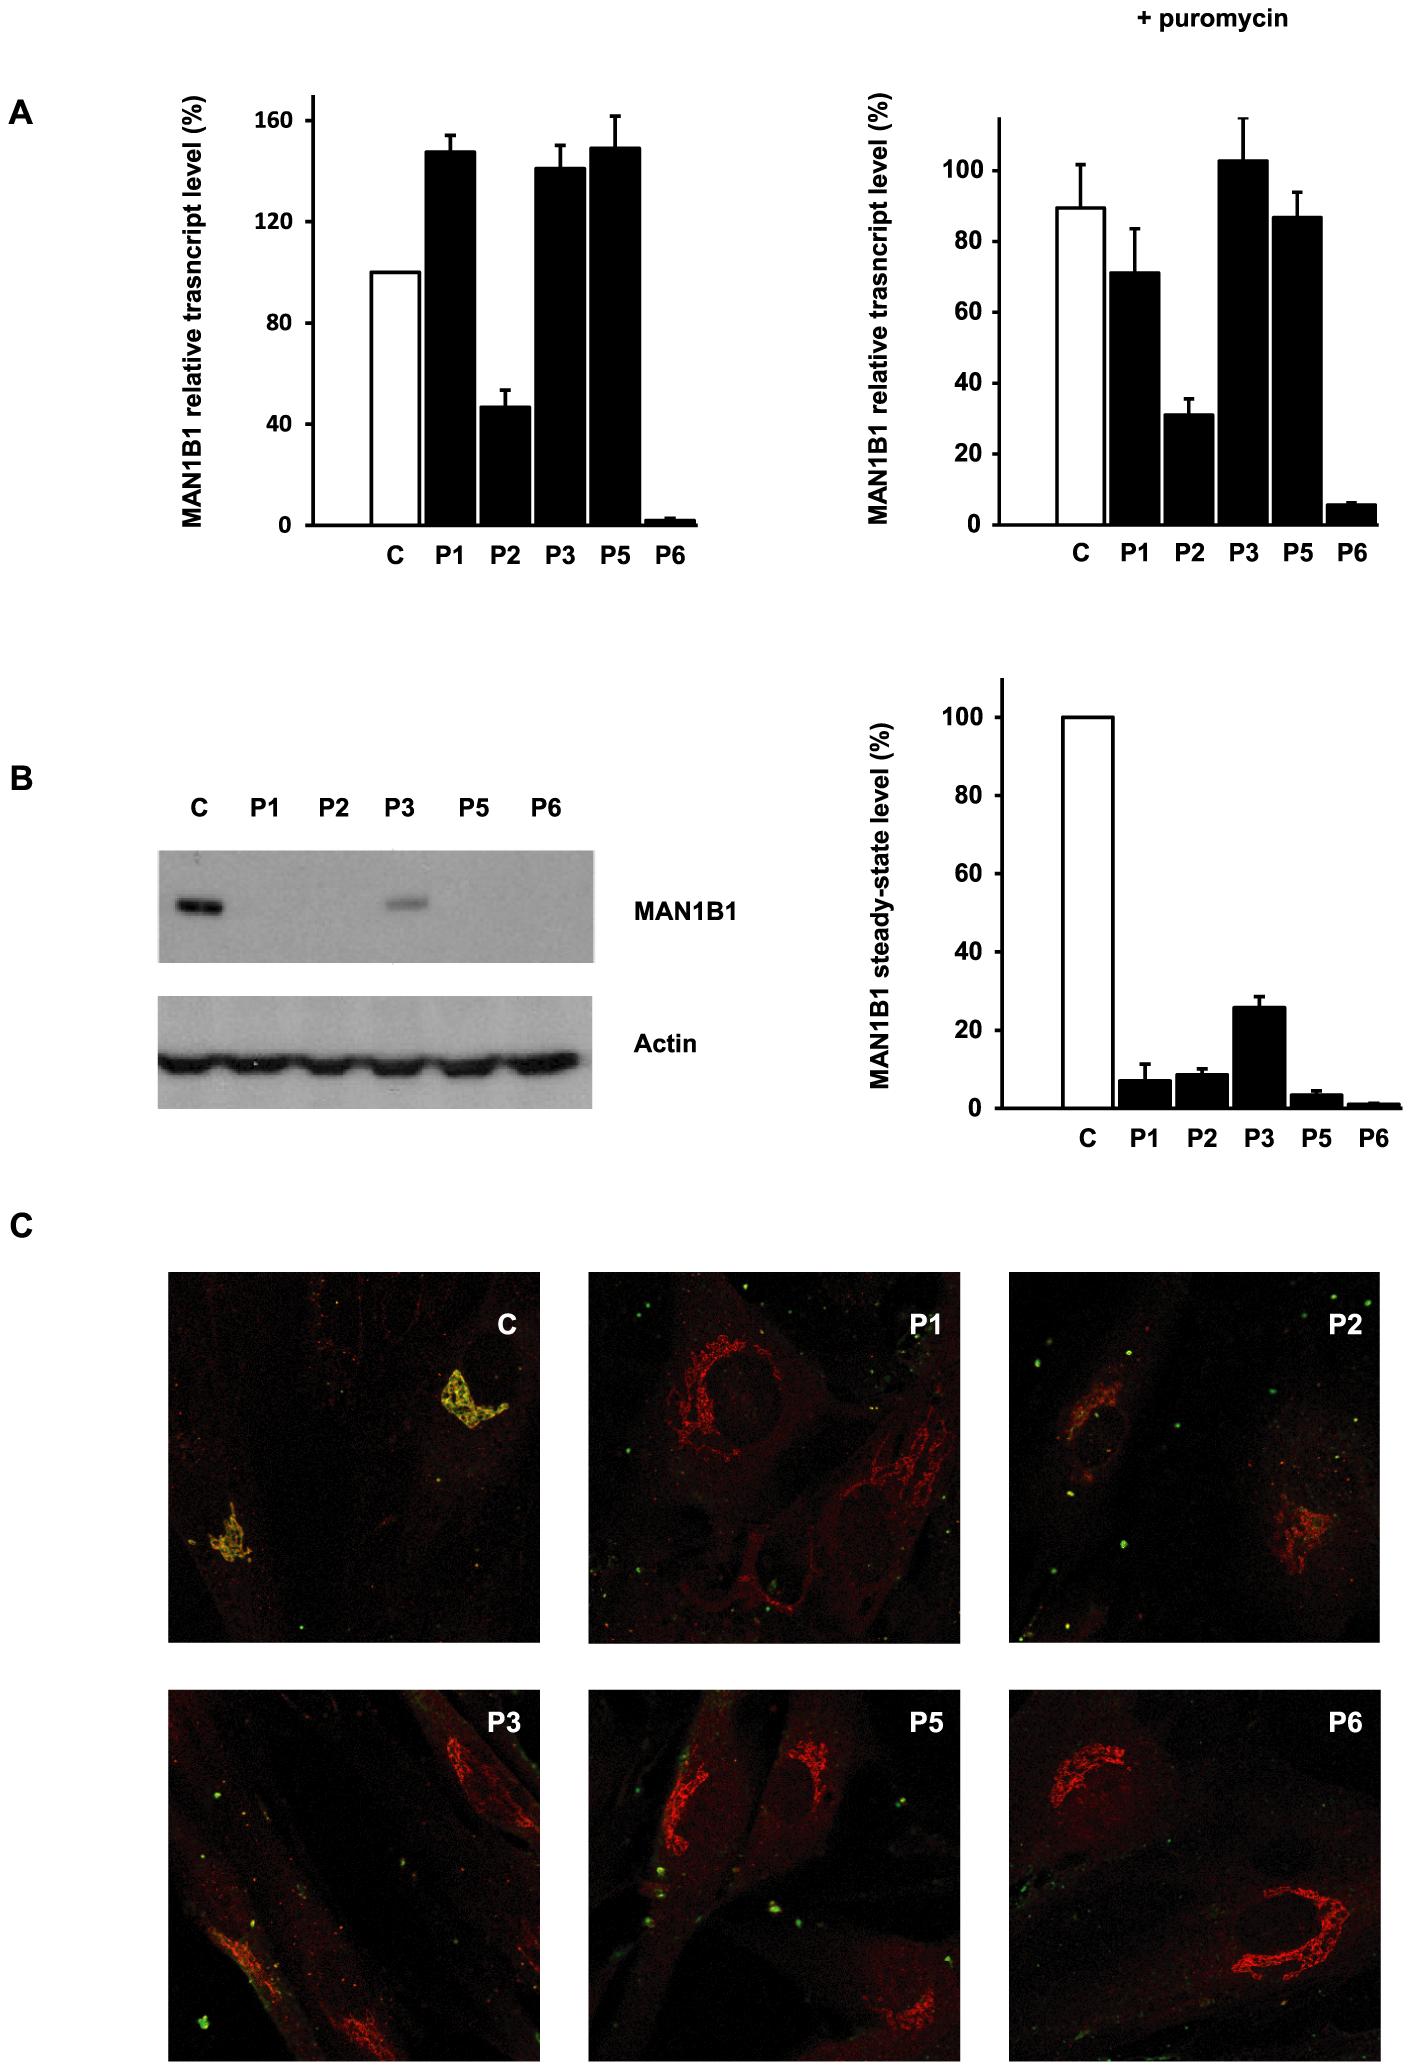 Functional analyses of <i>MAN1B1</i> mutations.